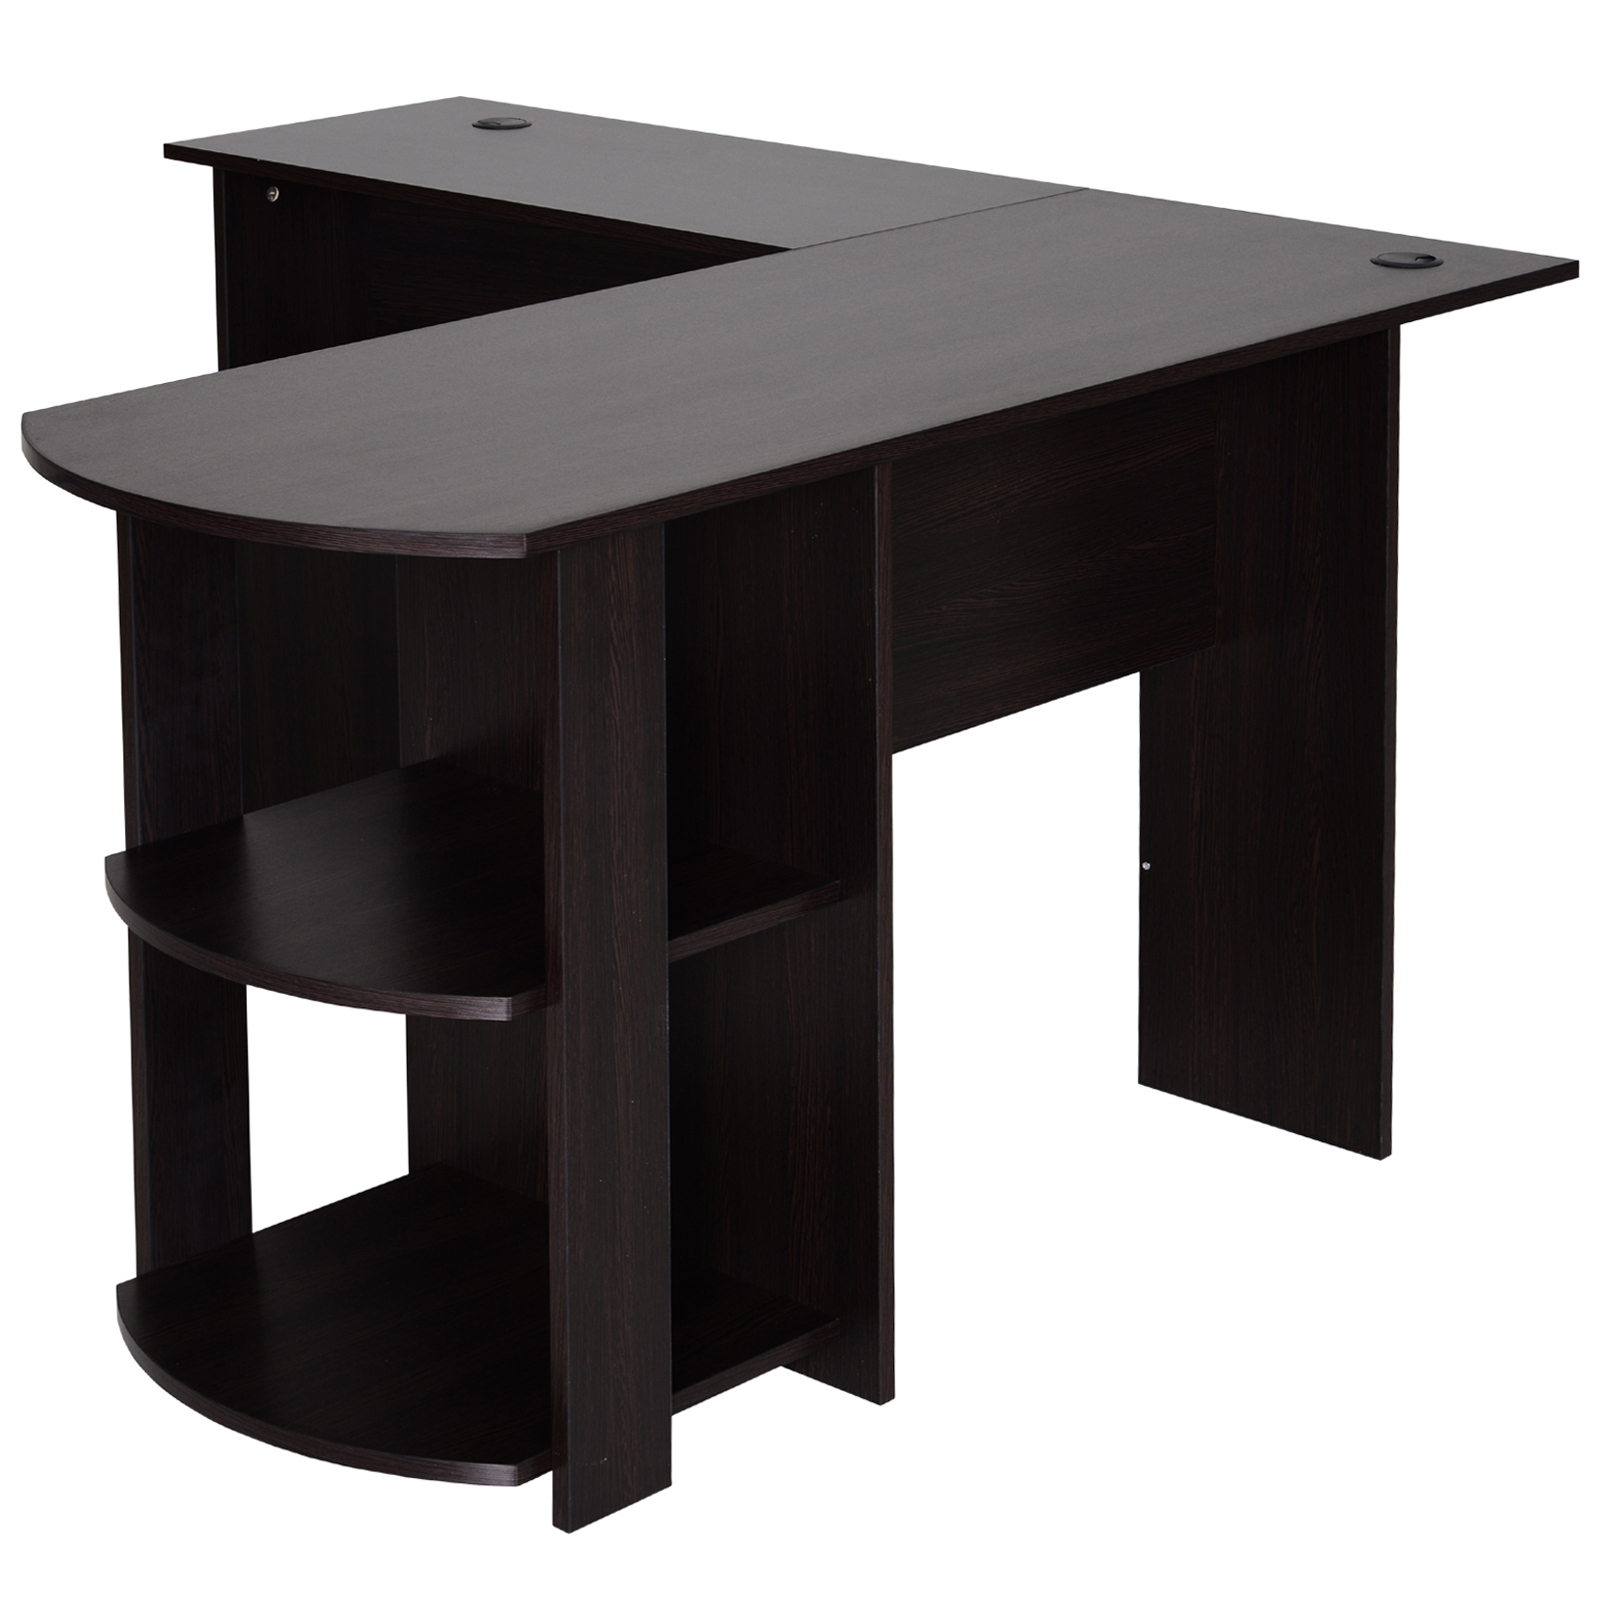 Mesa-de-Ordenador-PC-Escritorio-para-Oficina-Hogar-Esquinera-Forma-L-Madera miniatura 7